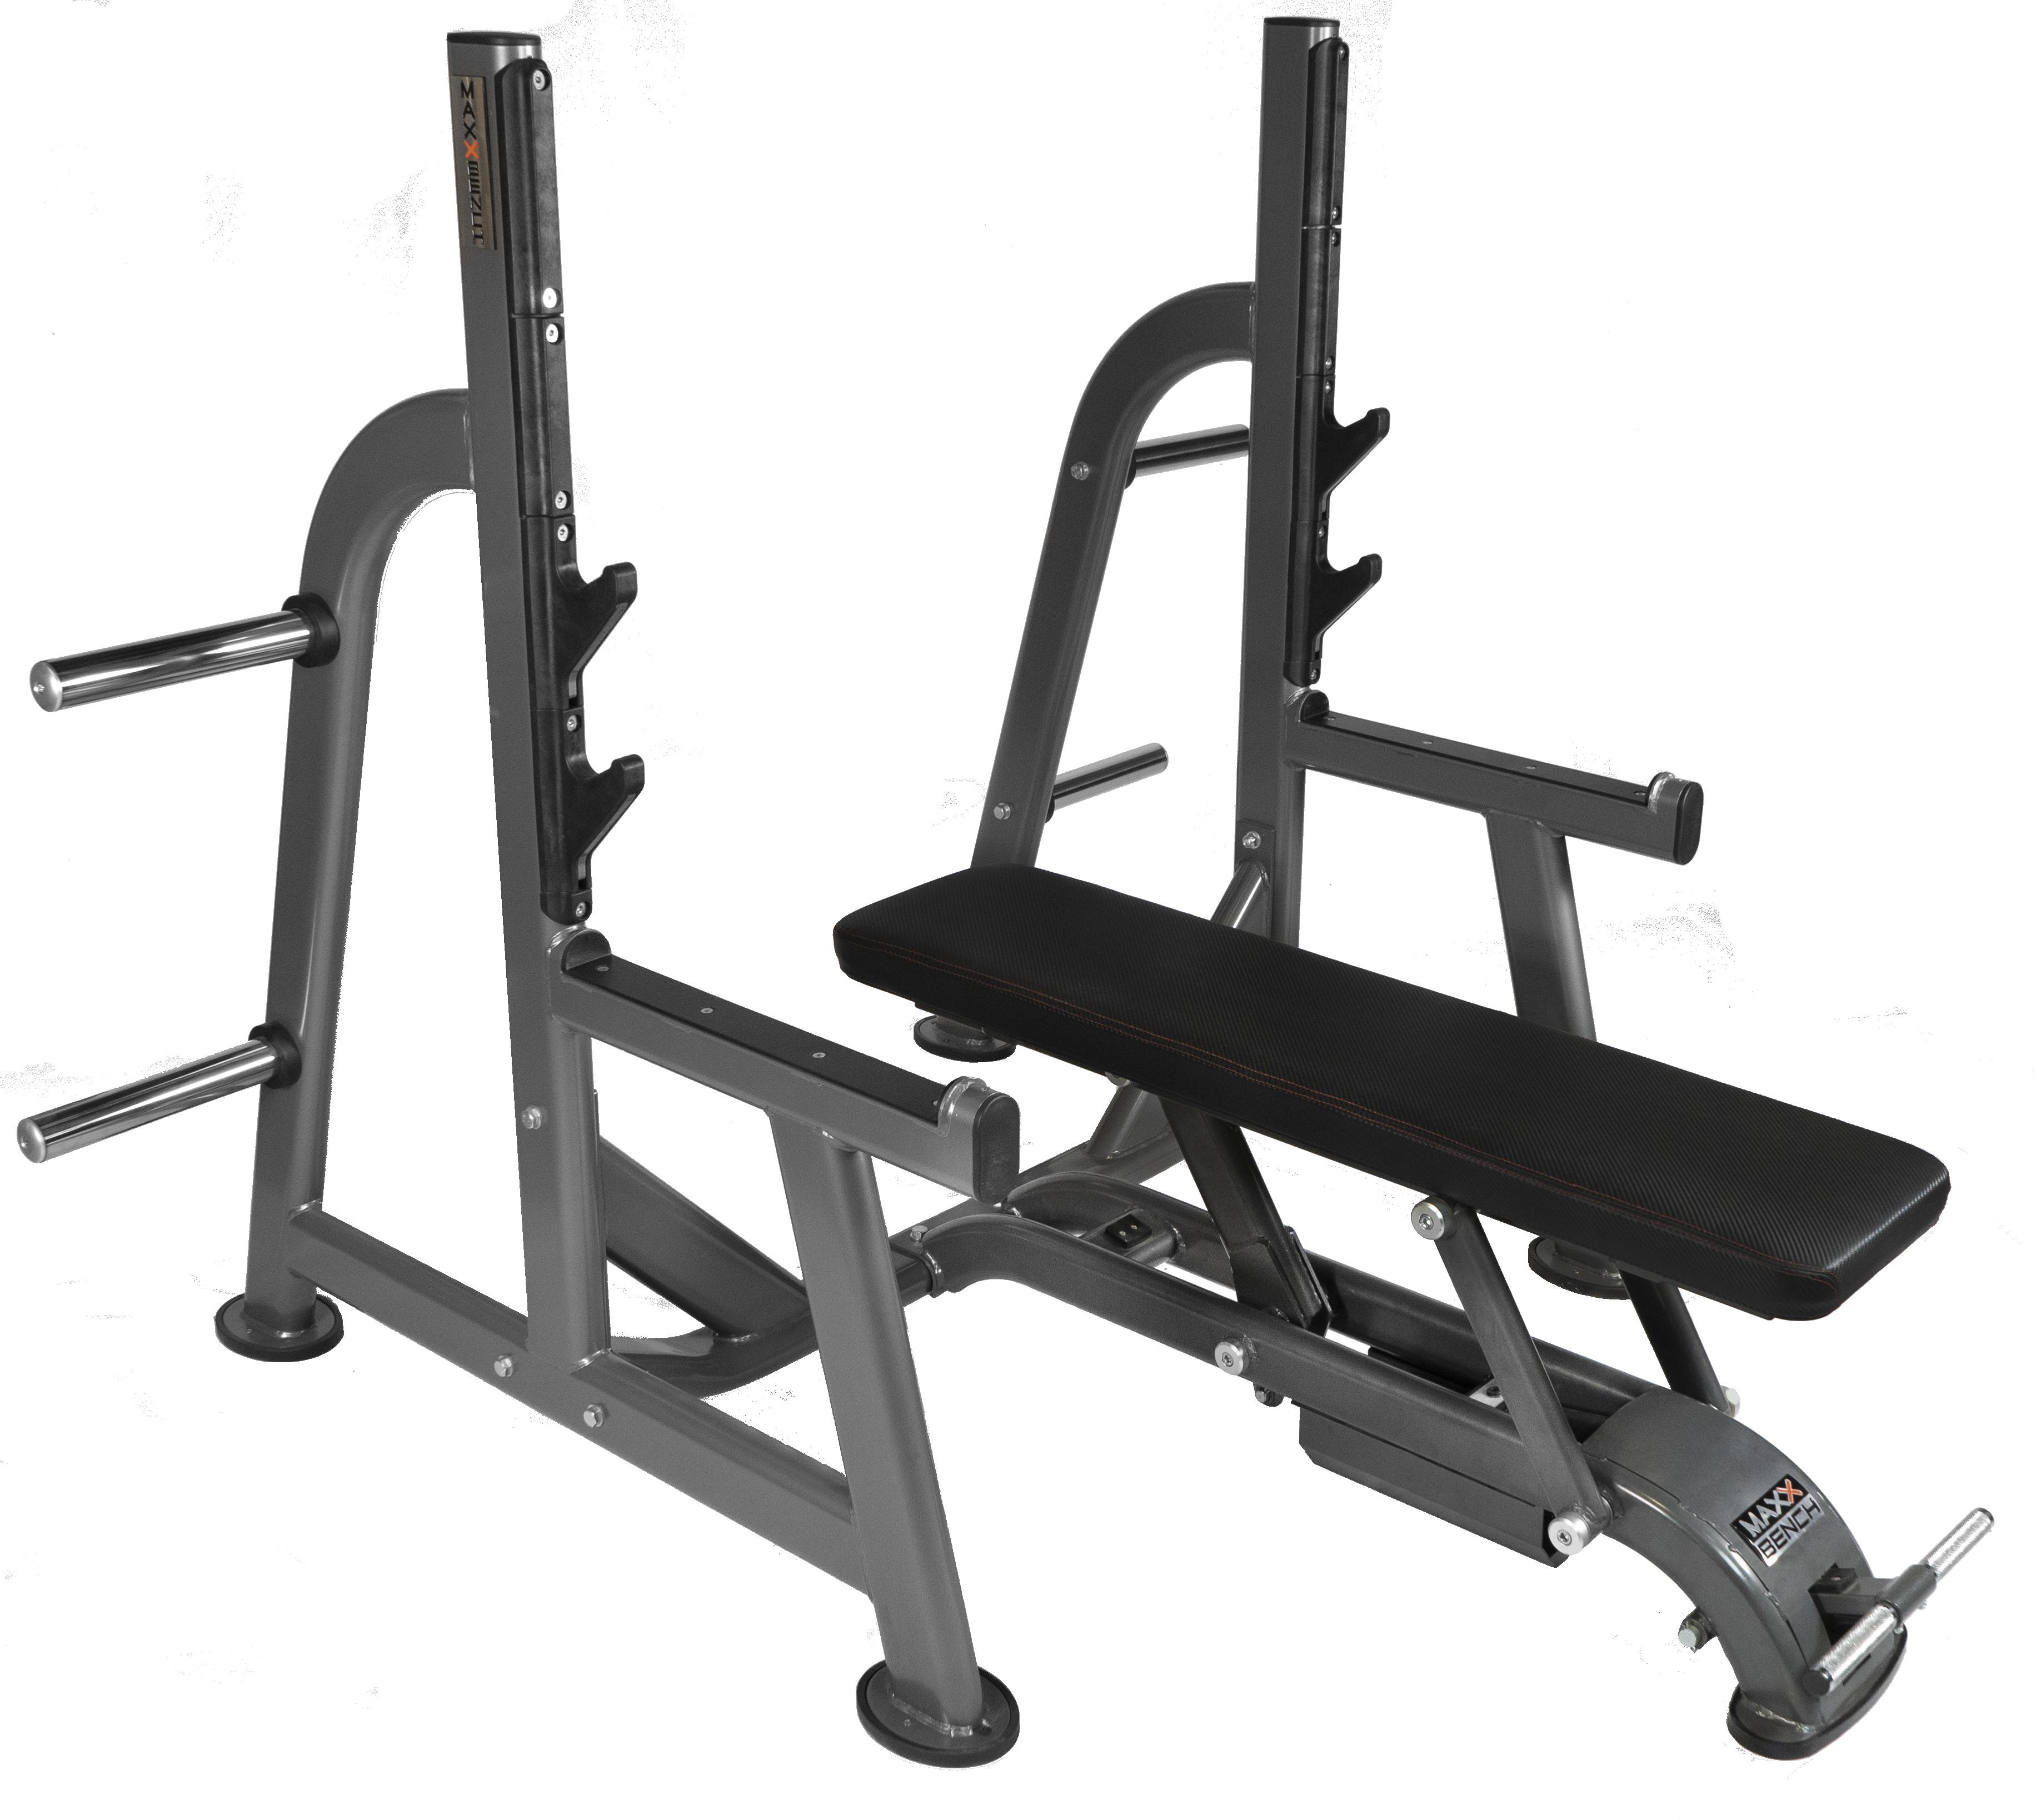 Maxx Strength Olympic Bench